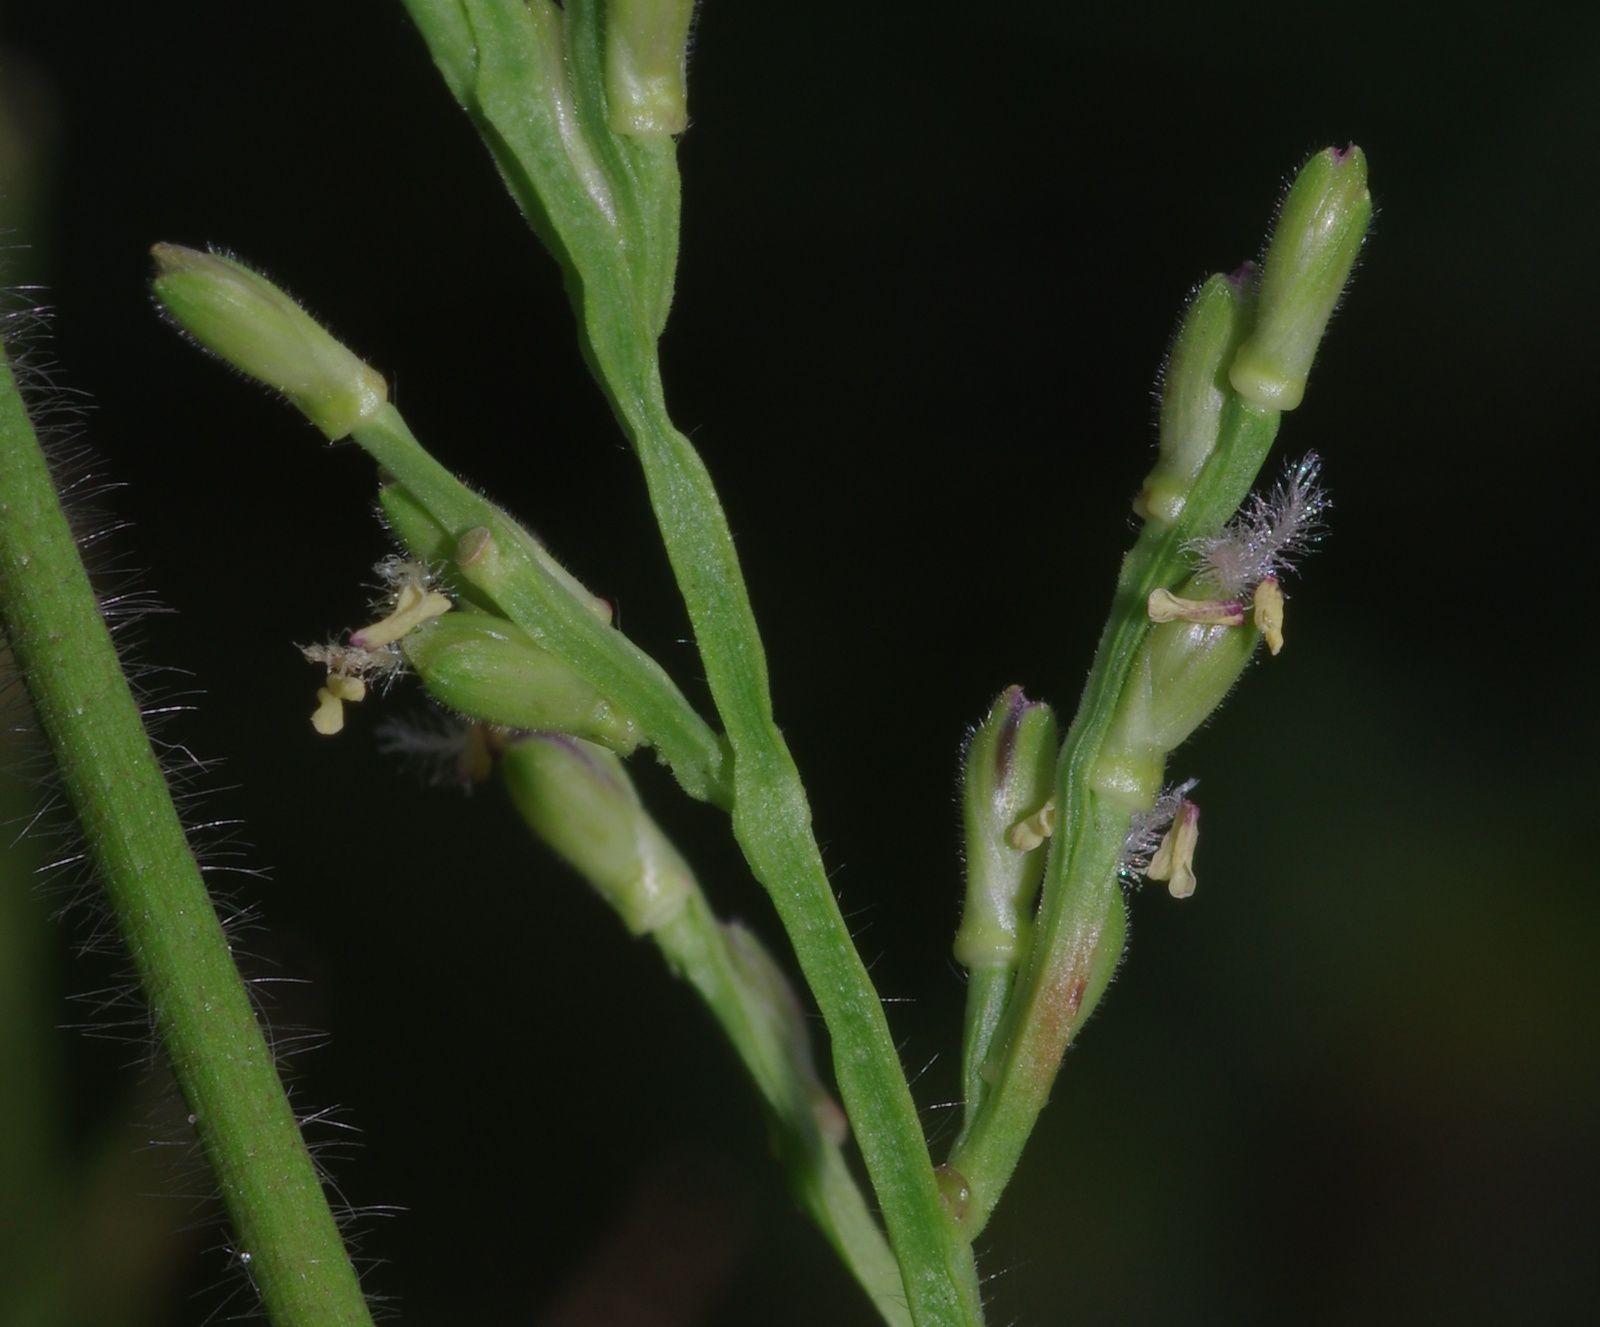 Streptostachys asperifolia